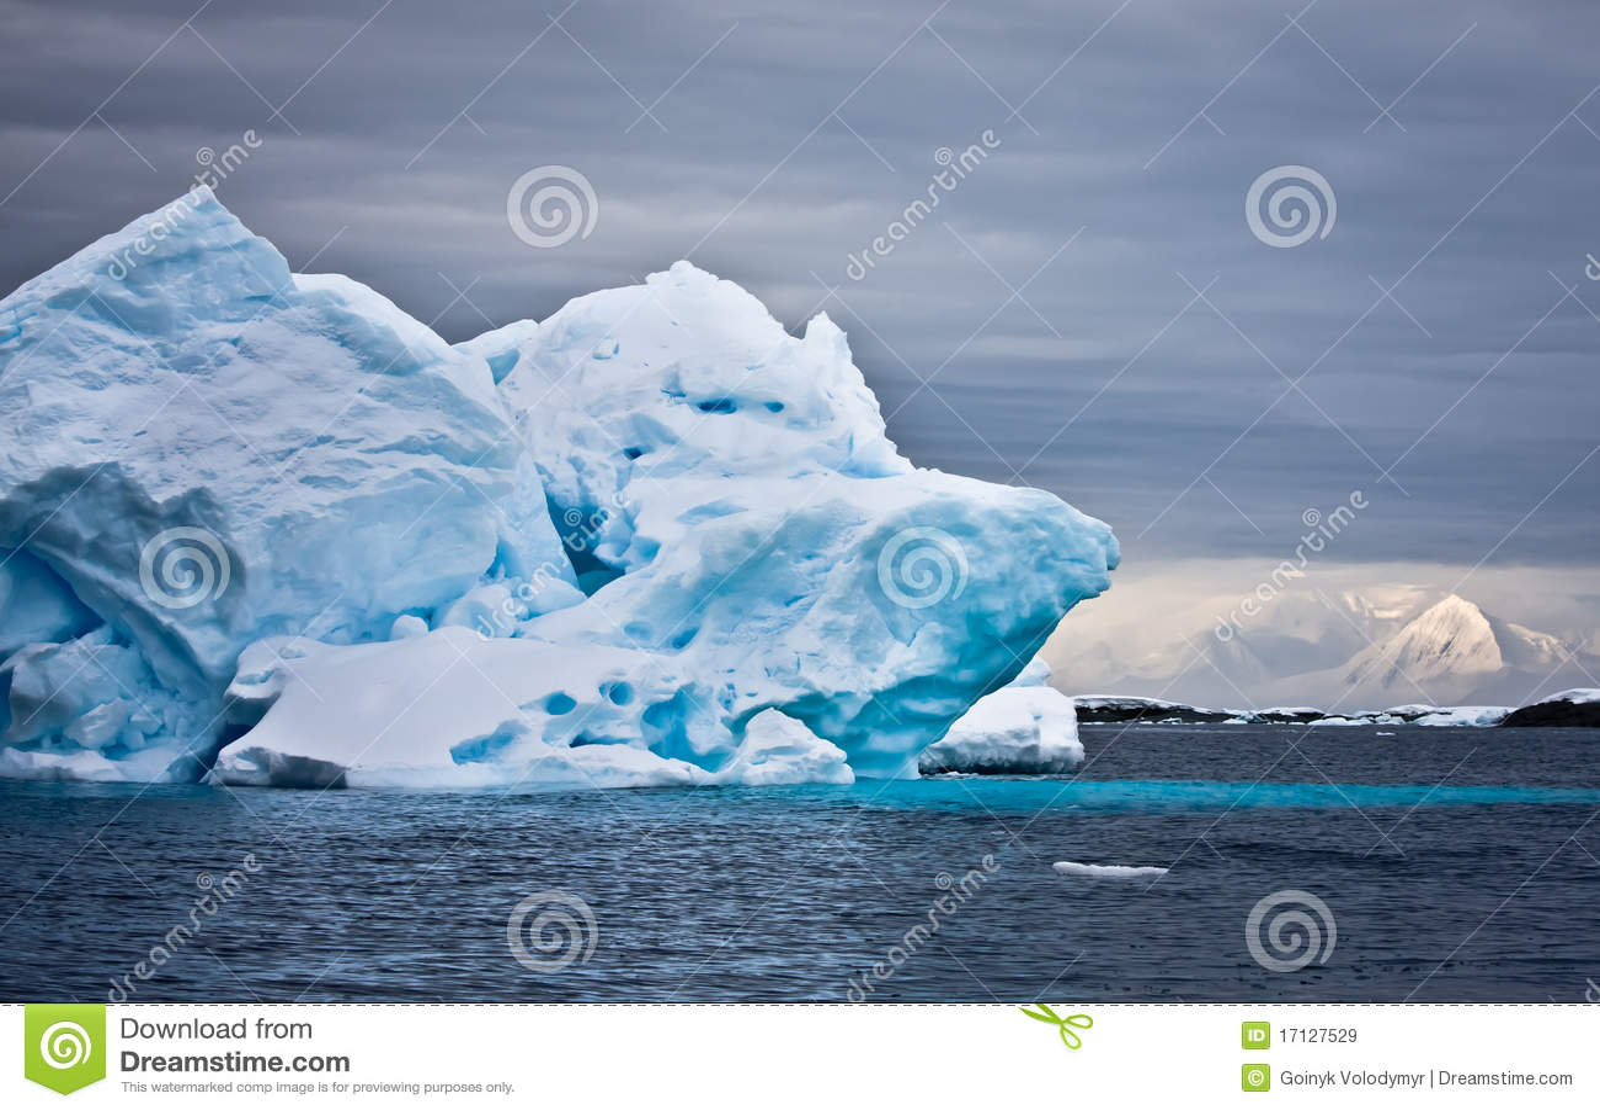 Sehr großer Eisberg in Antarktik